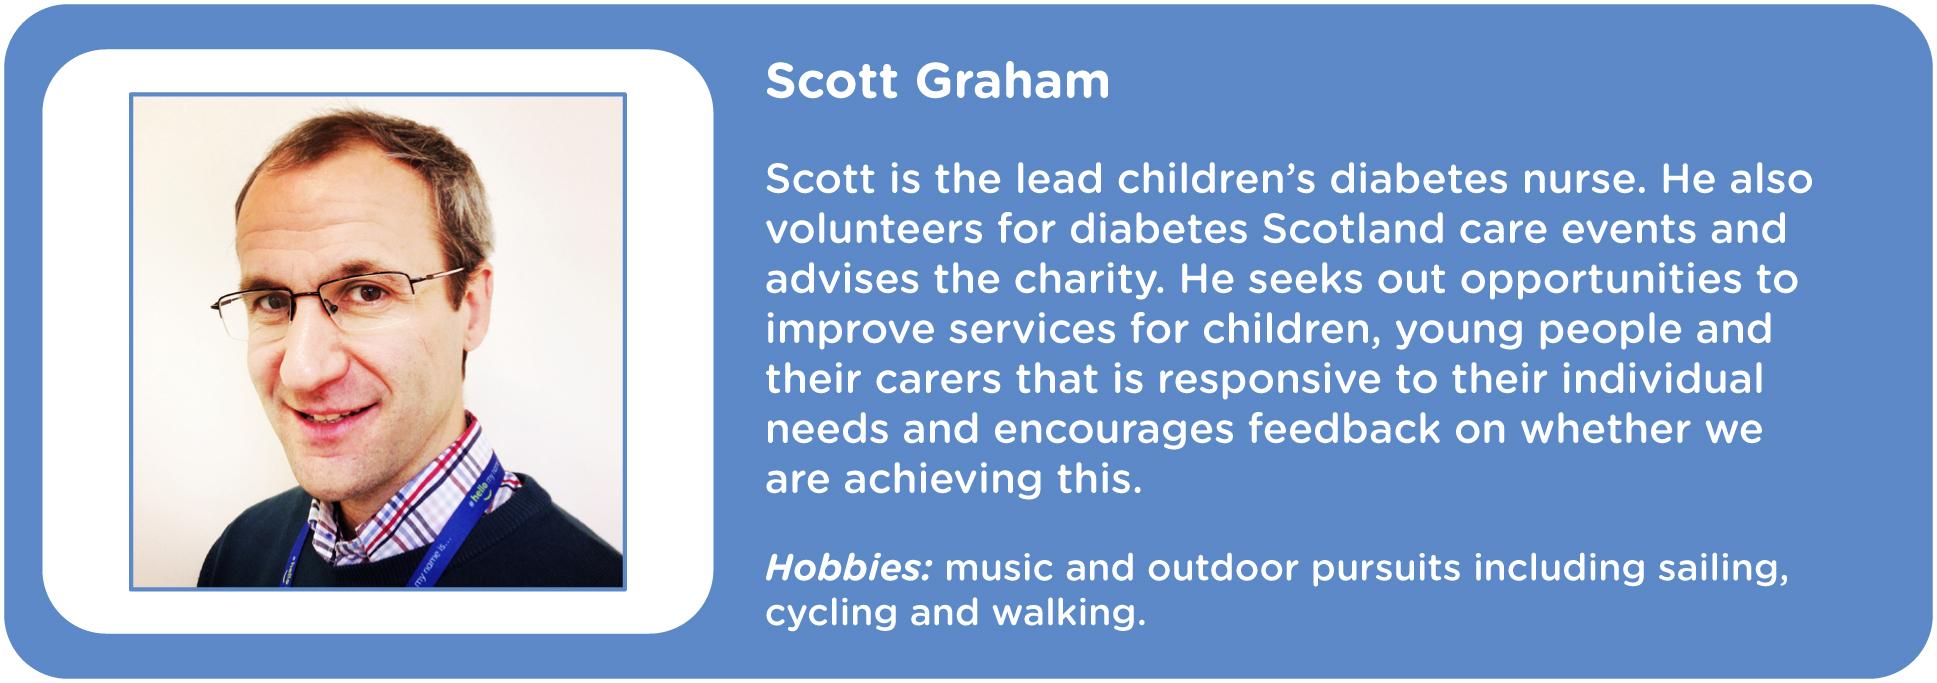 Scott Graham